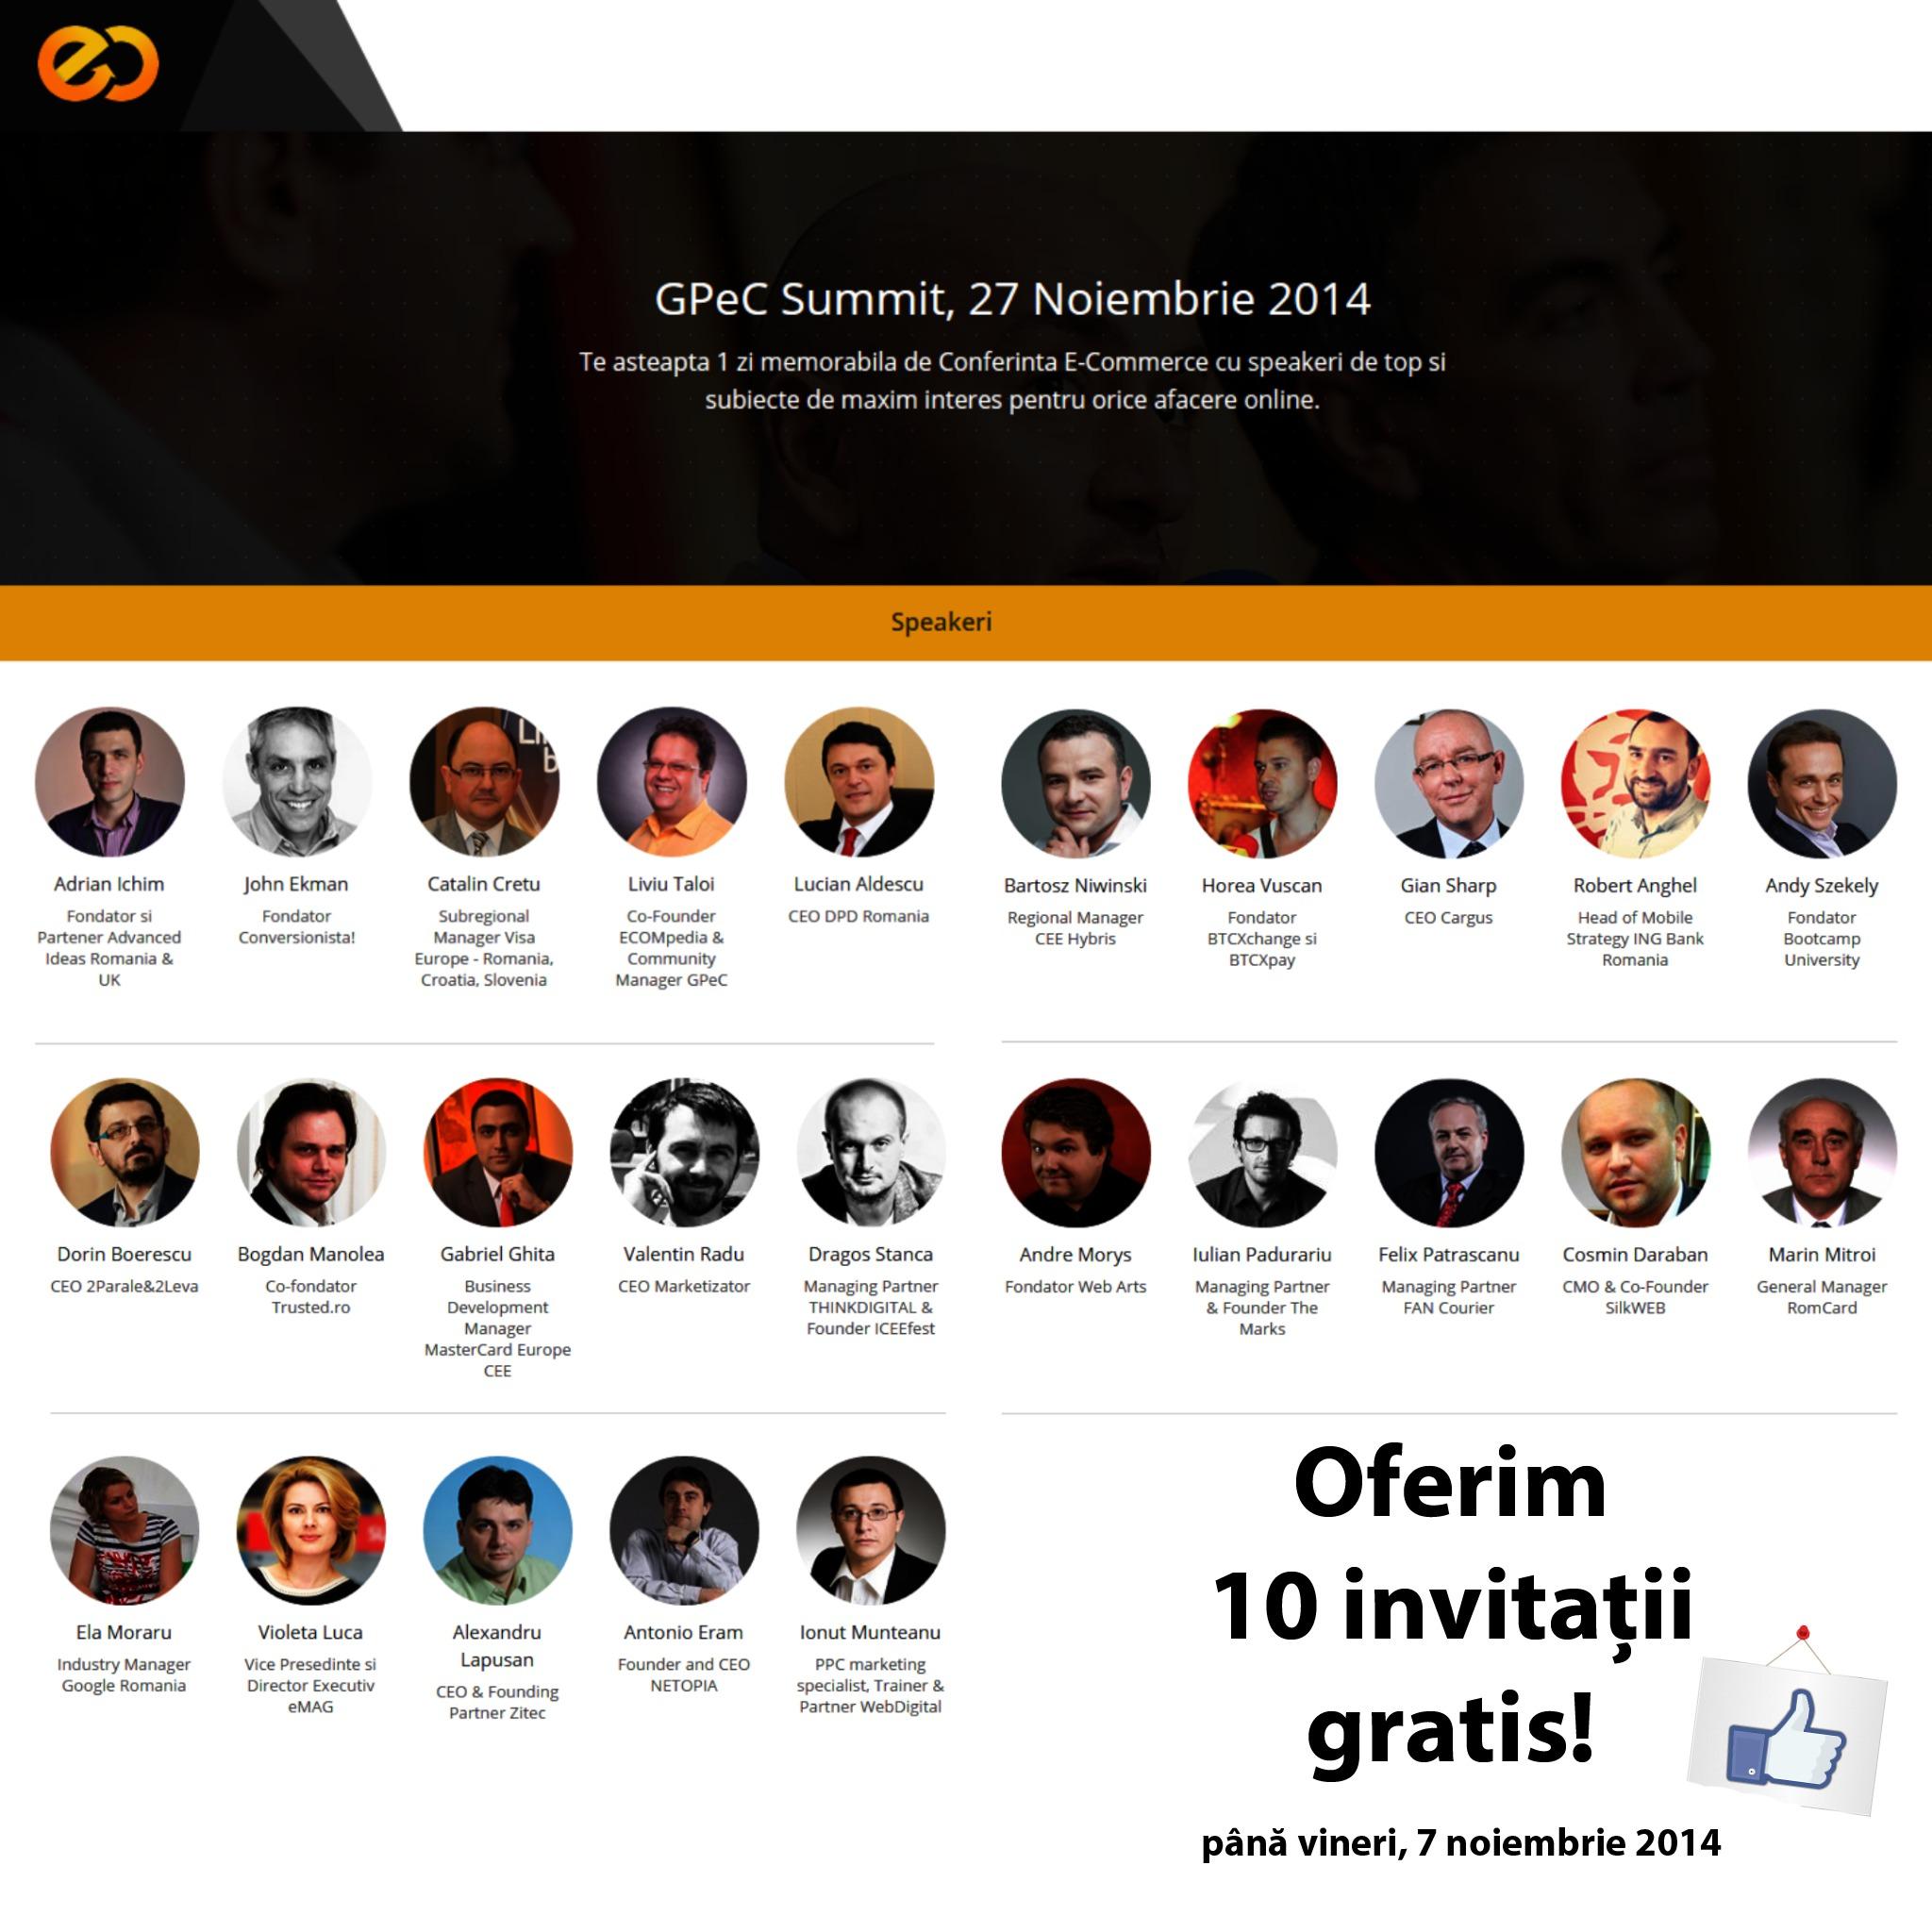 castiga 10 invitatii la gpec 2014